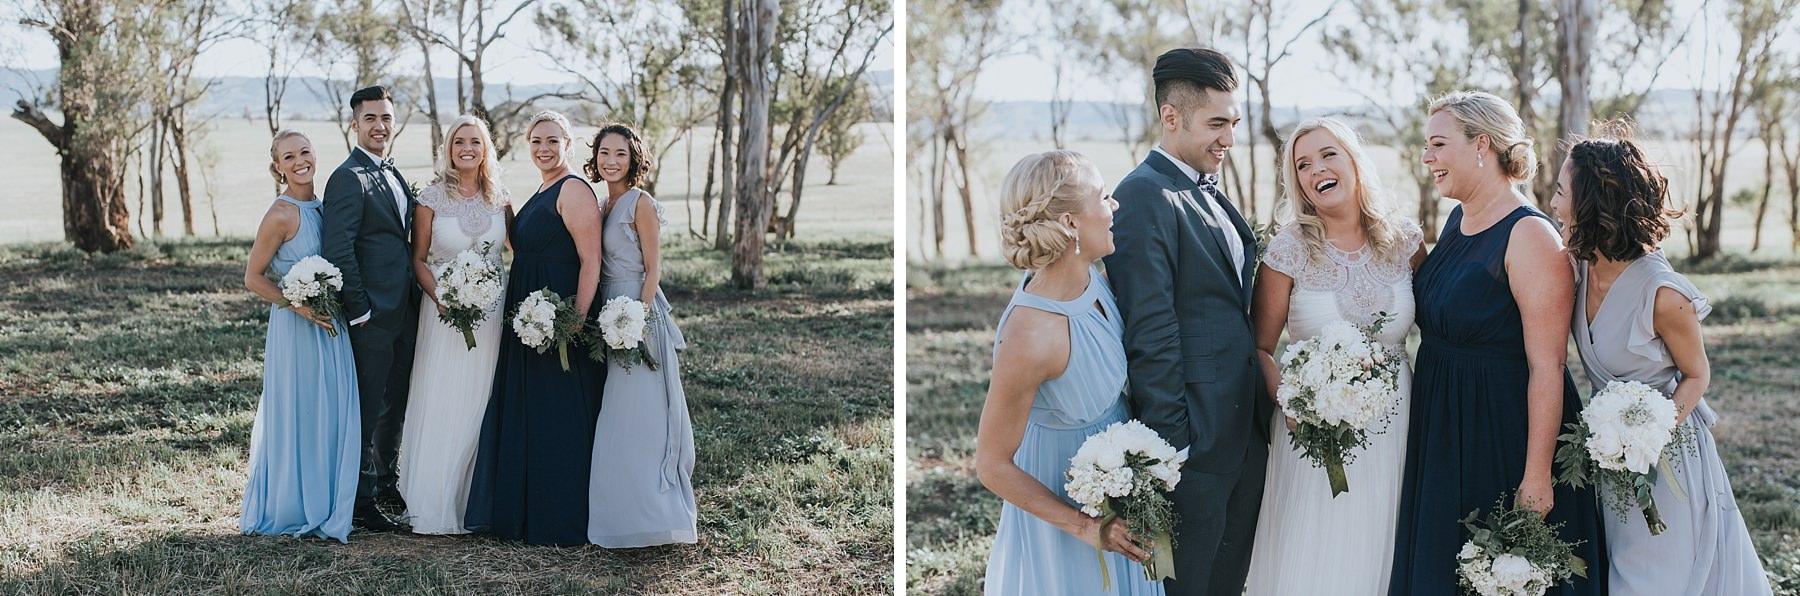 mudgee bridal party photos